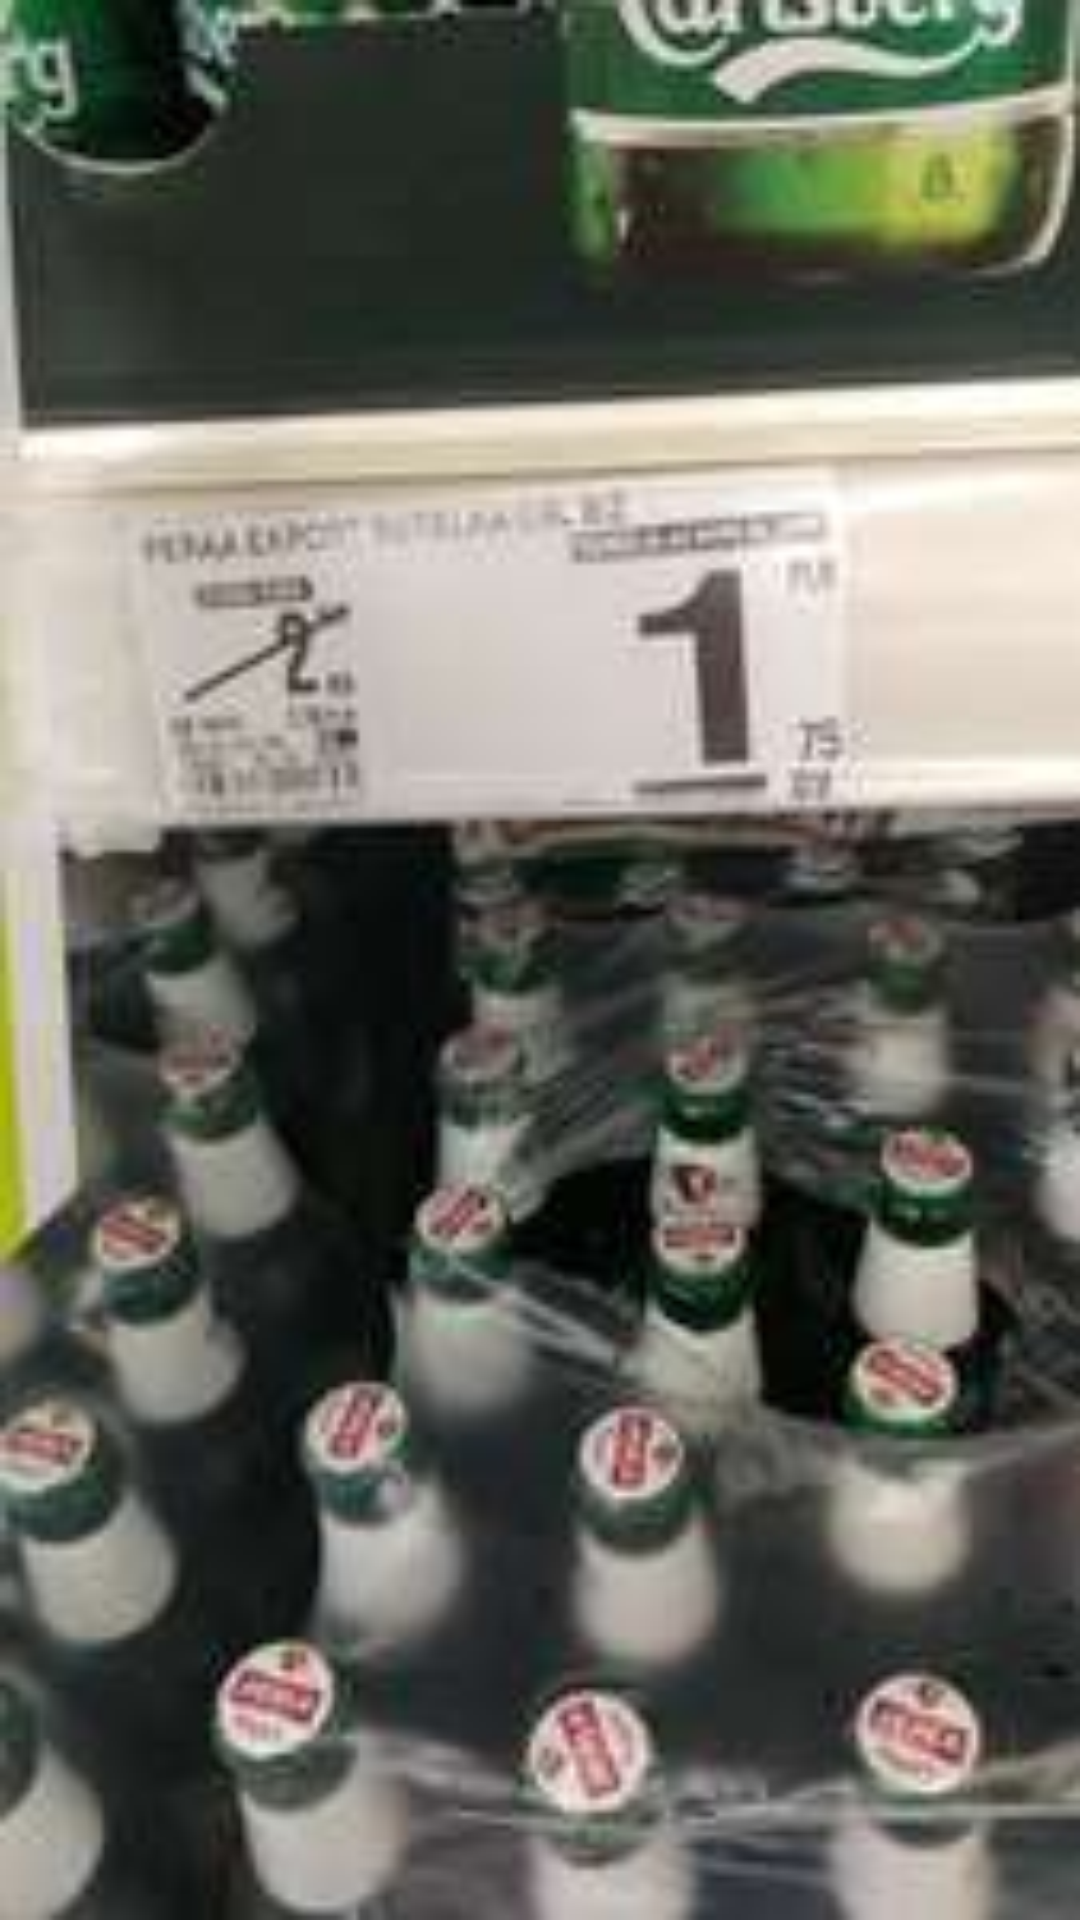 Piwo Perła Export 500ml @Bi1 Legnica